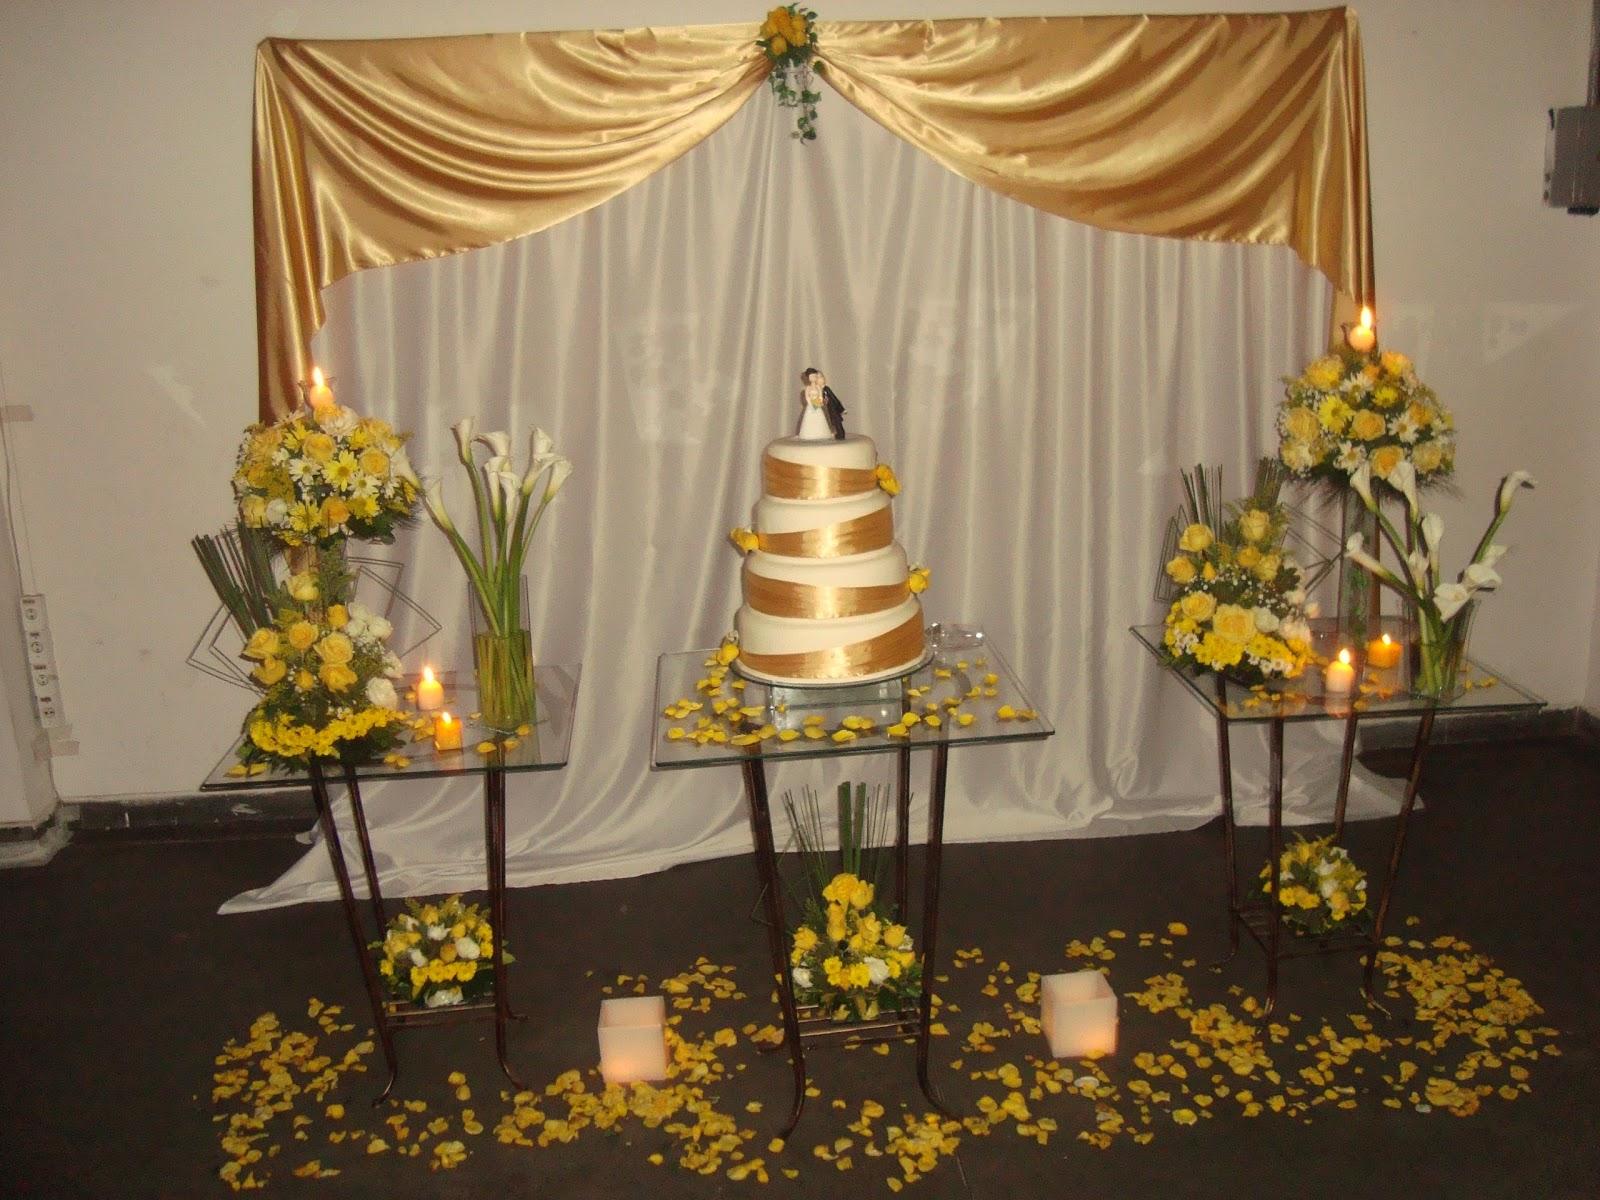 decoracao branca e dourada para casamento : decoracao branca e dourada para casamento:Postado por Djalma Decorador Alagoas às 04:41